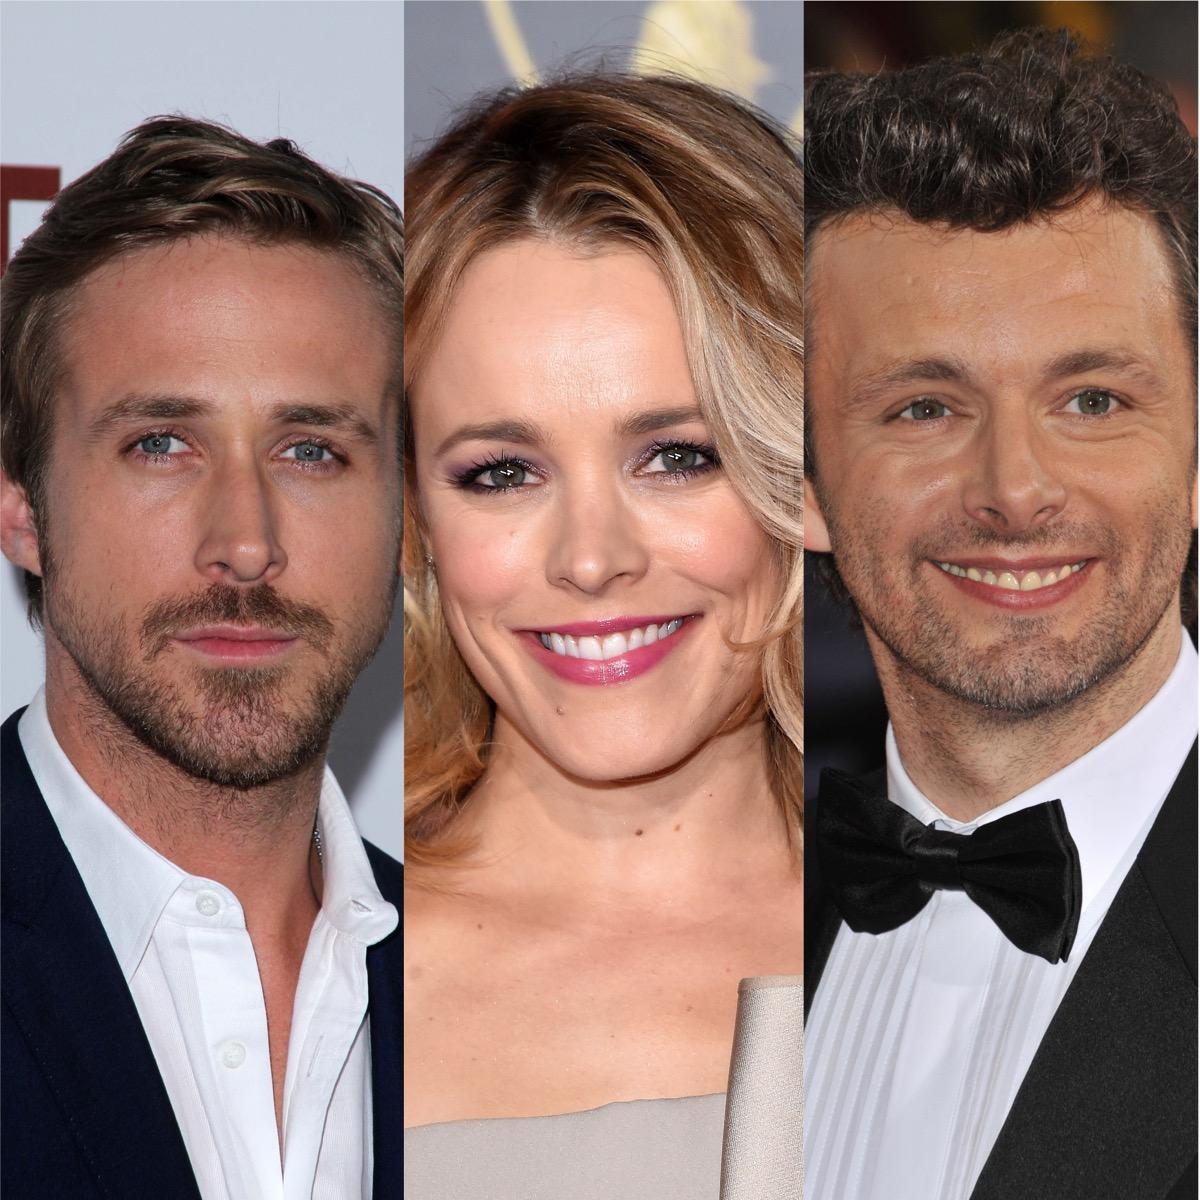 Ryan Gosling, Rachel McAdams, and Michael Sheen